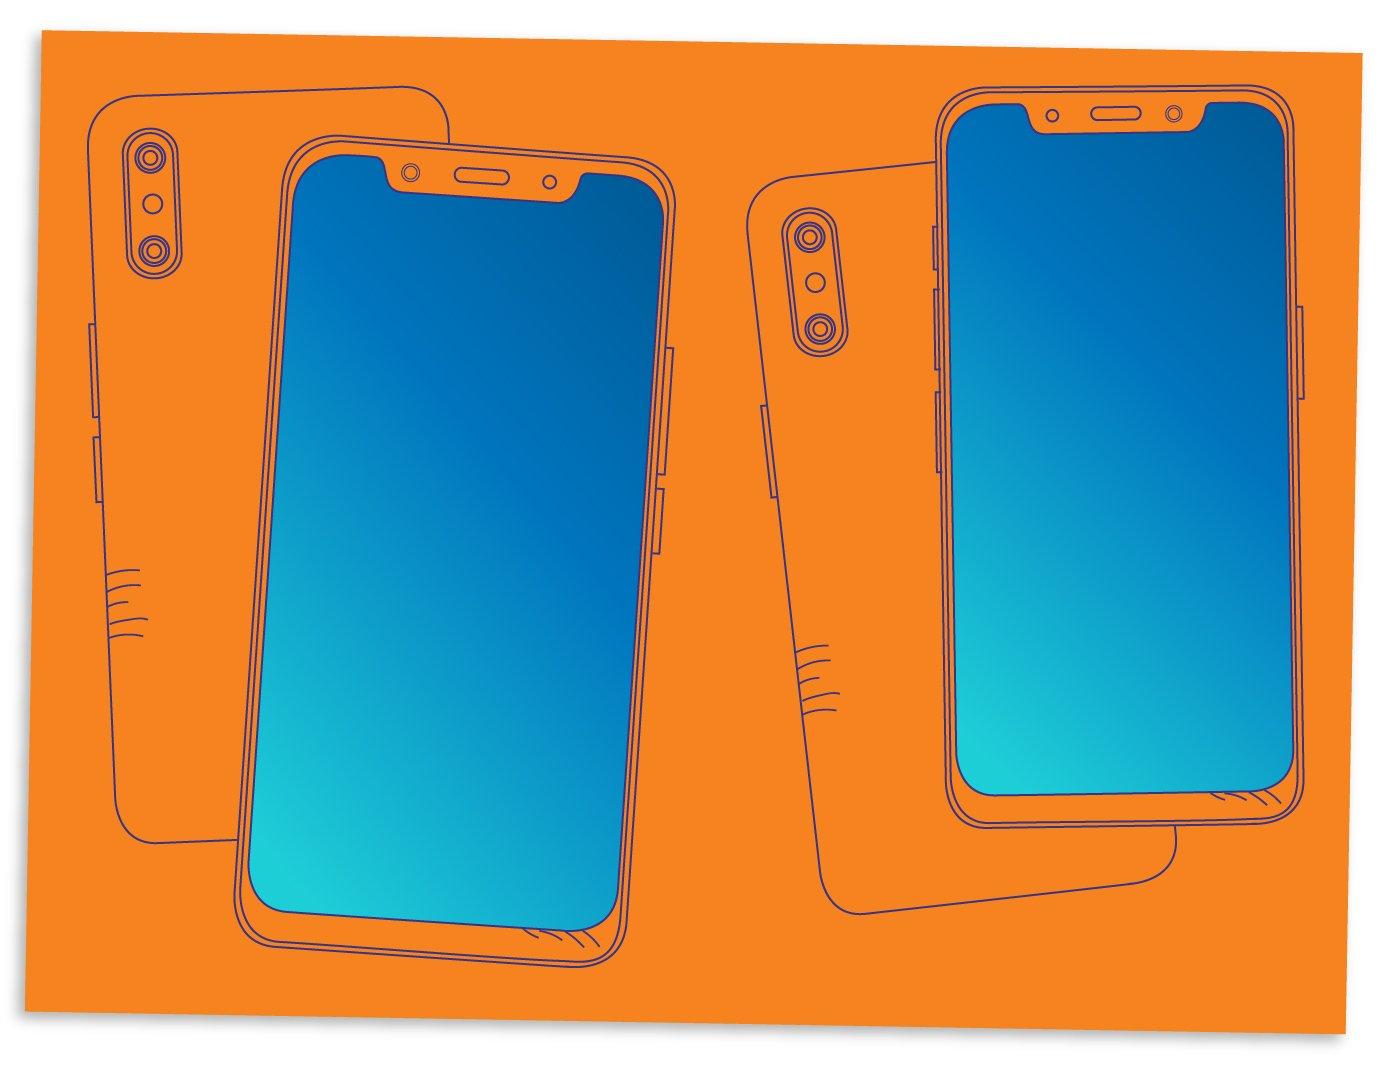 XiaomiVSIphone